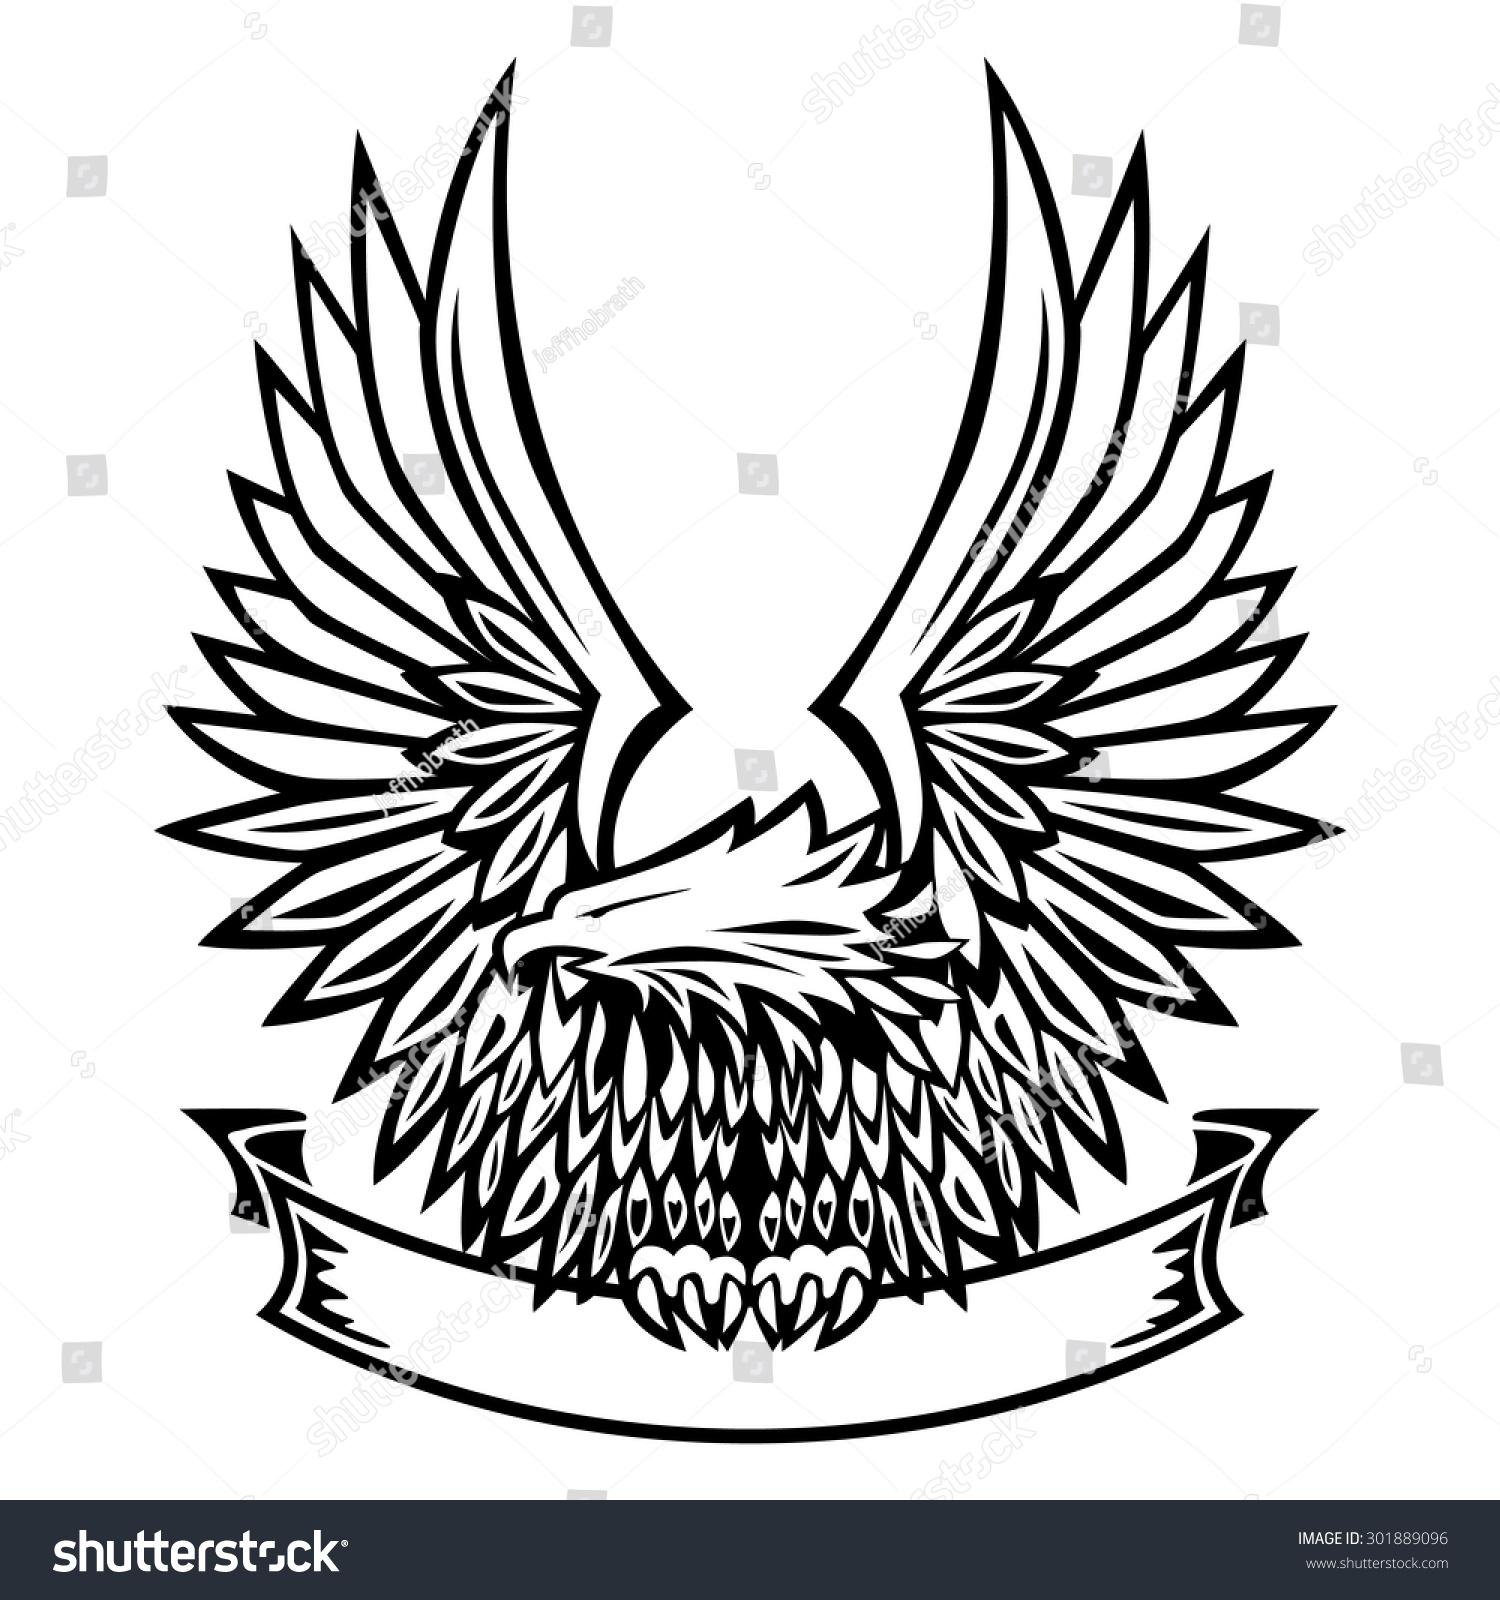 eagle wings vector www pixshark com images galleries bald eagle clip art free bald eagle clip art printable